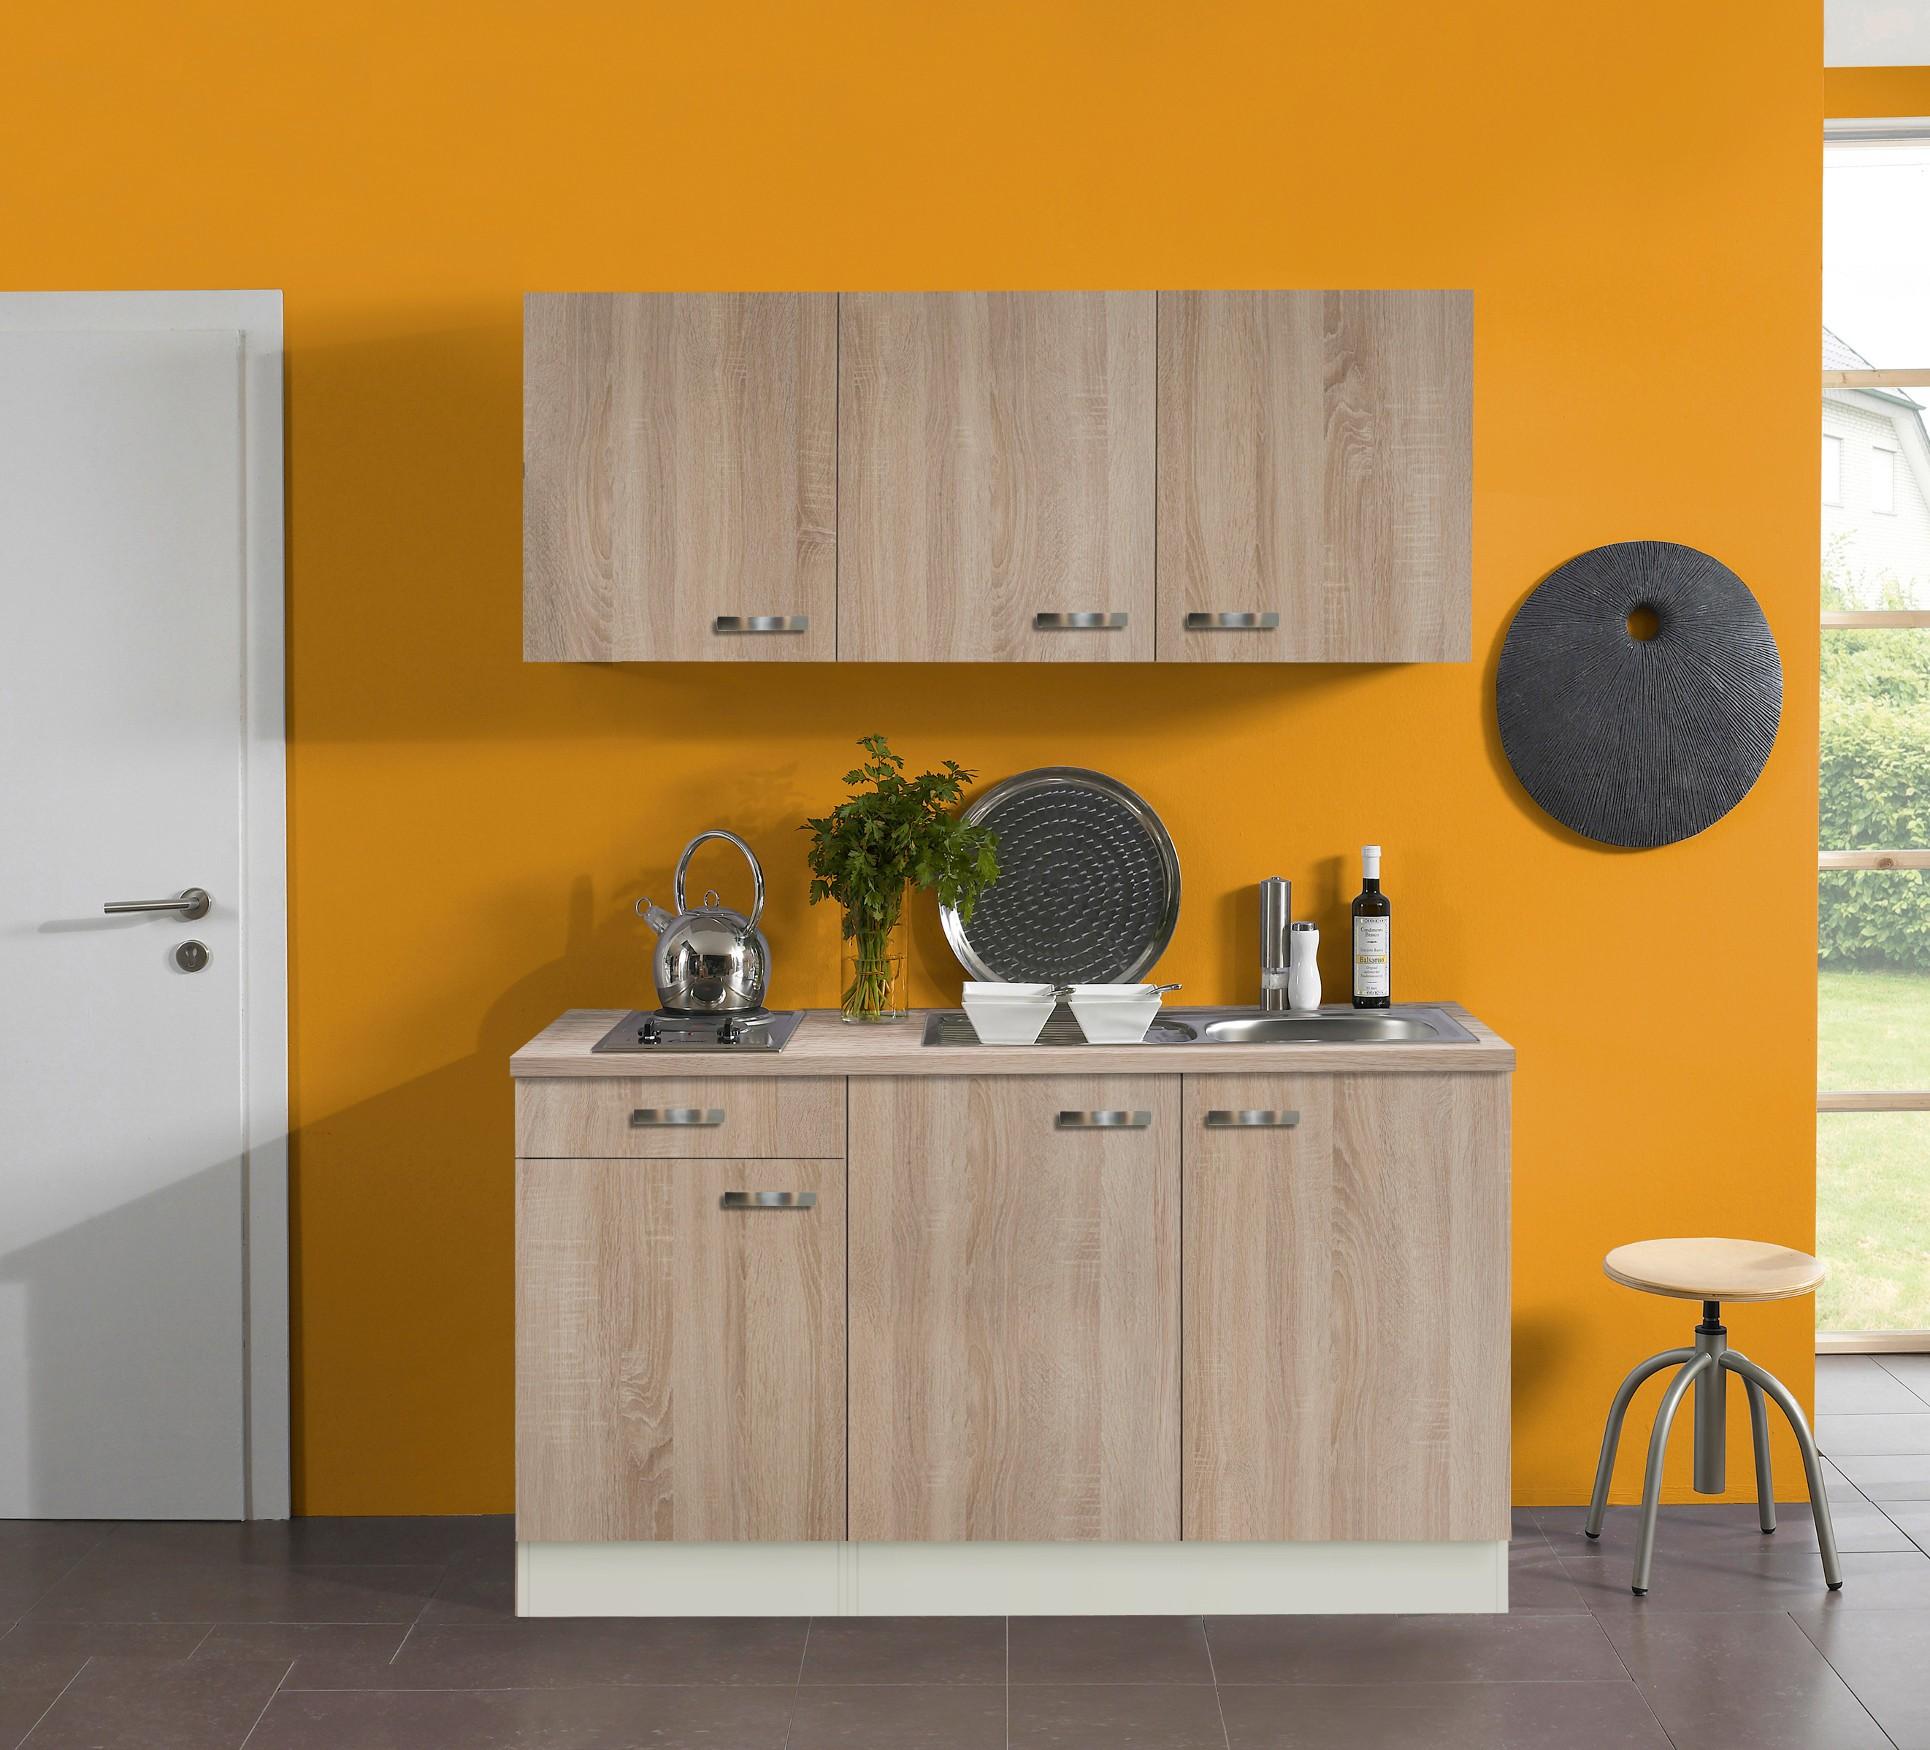 singlek che toledo mit elektro kochfeld 7 teilig breite 150 cm eiche k che singlek chen. Black Bedroom Furniture Sets. Home Design Ideas